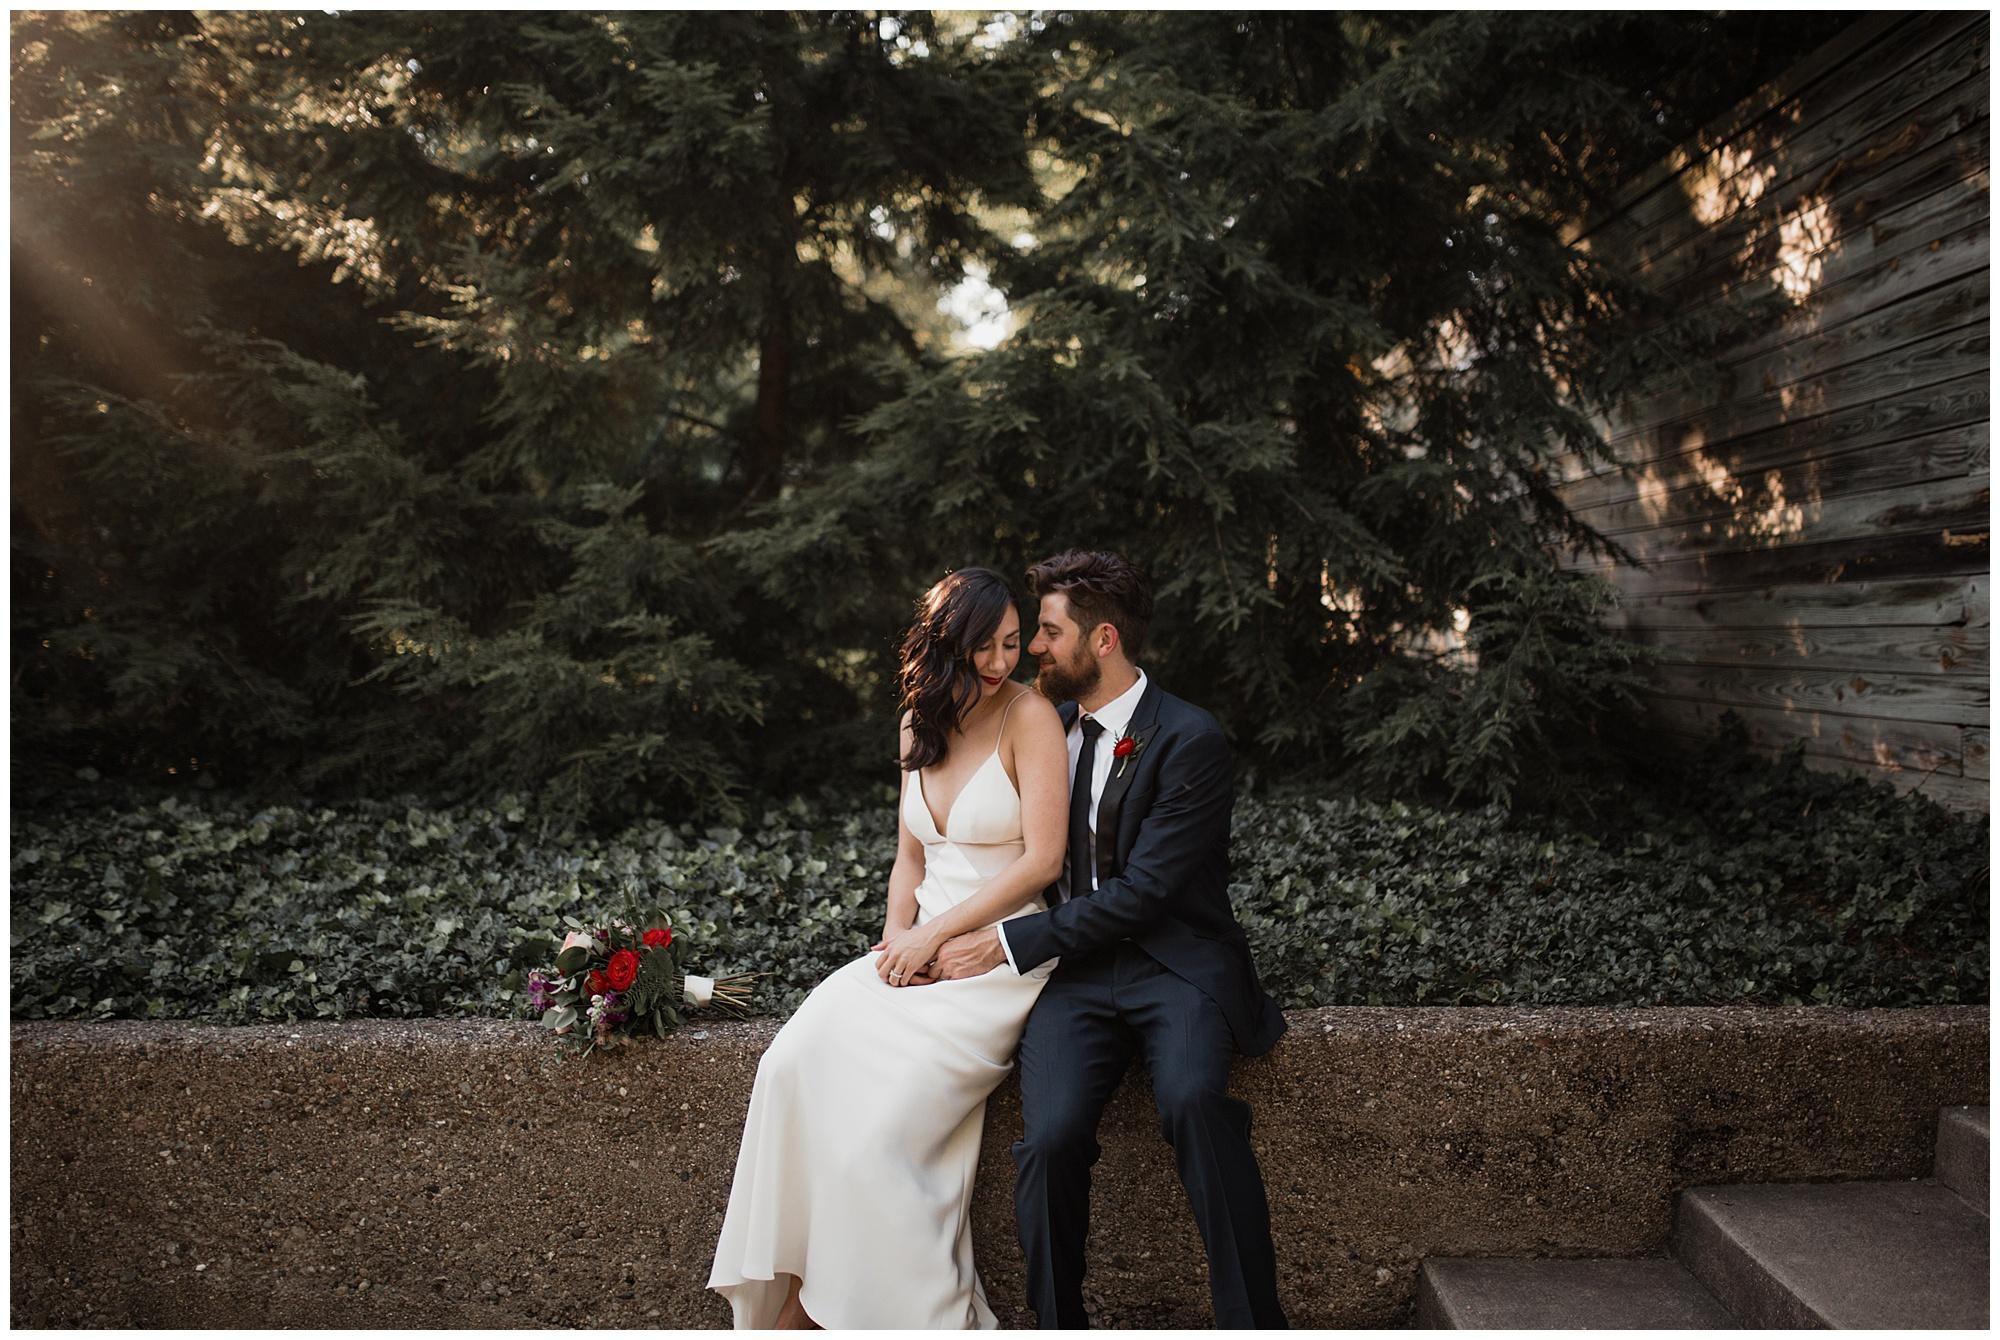 allerton_park_wedding_champaign_il_chicago_wright_photographs_ne_0099.jpg